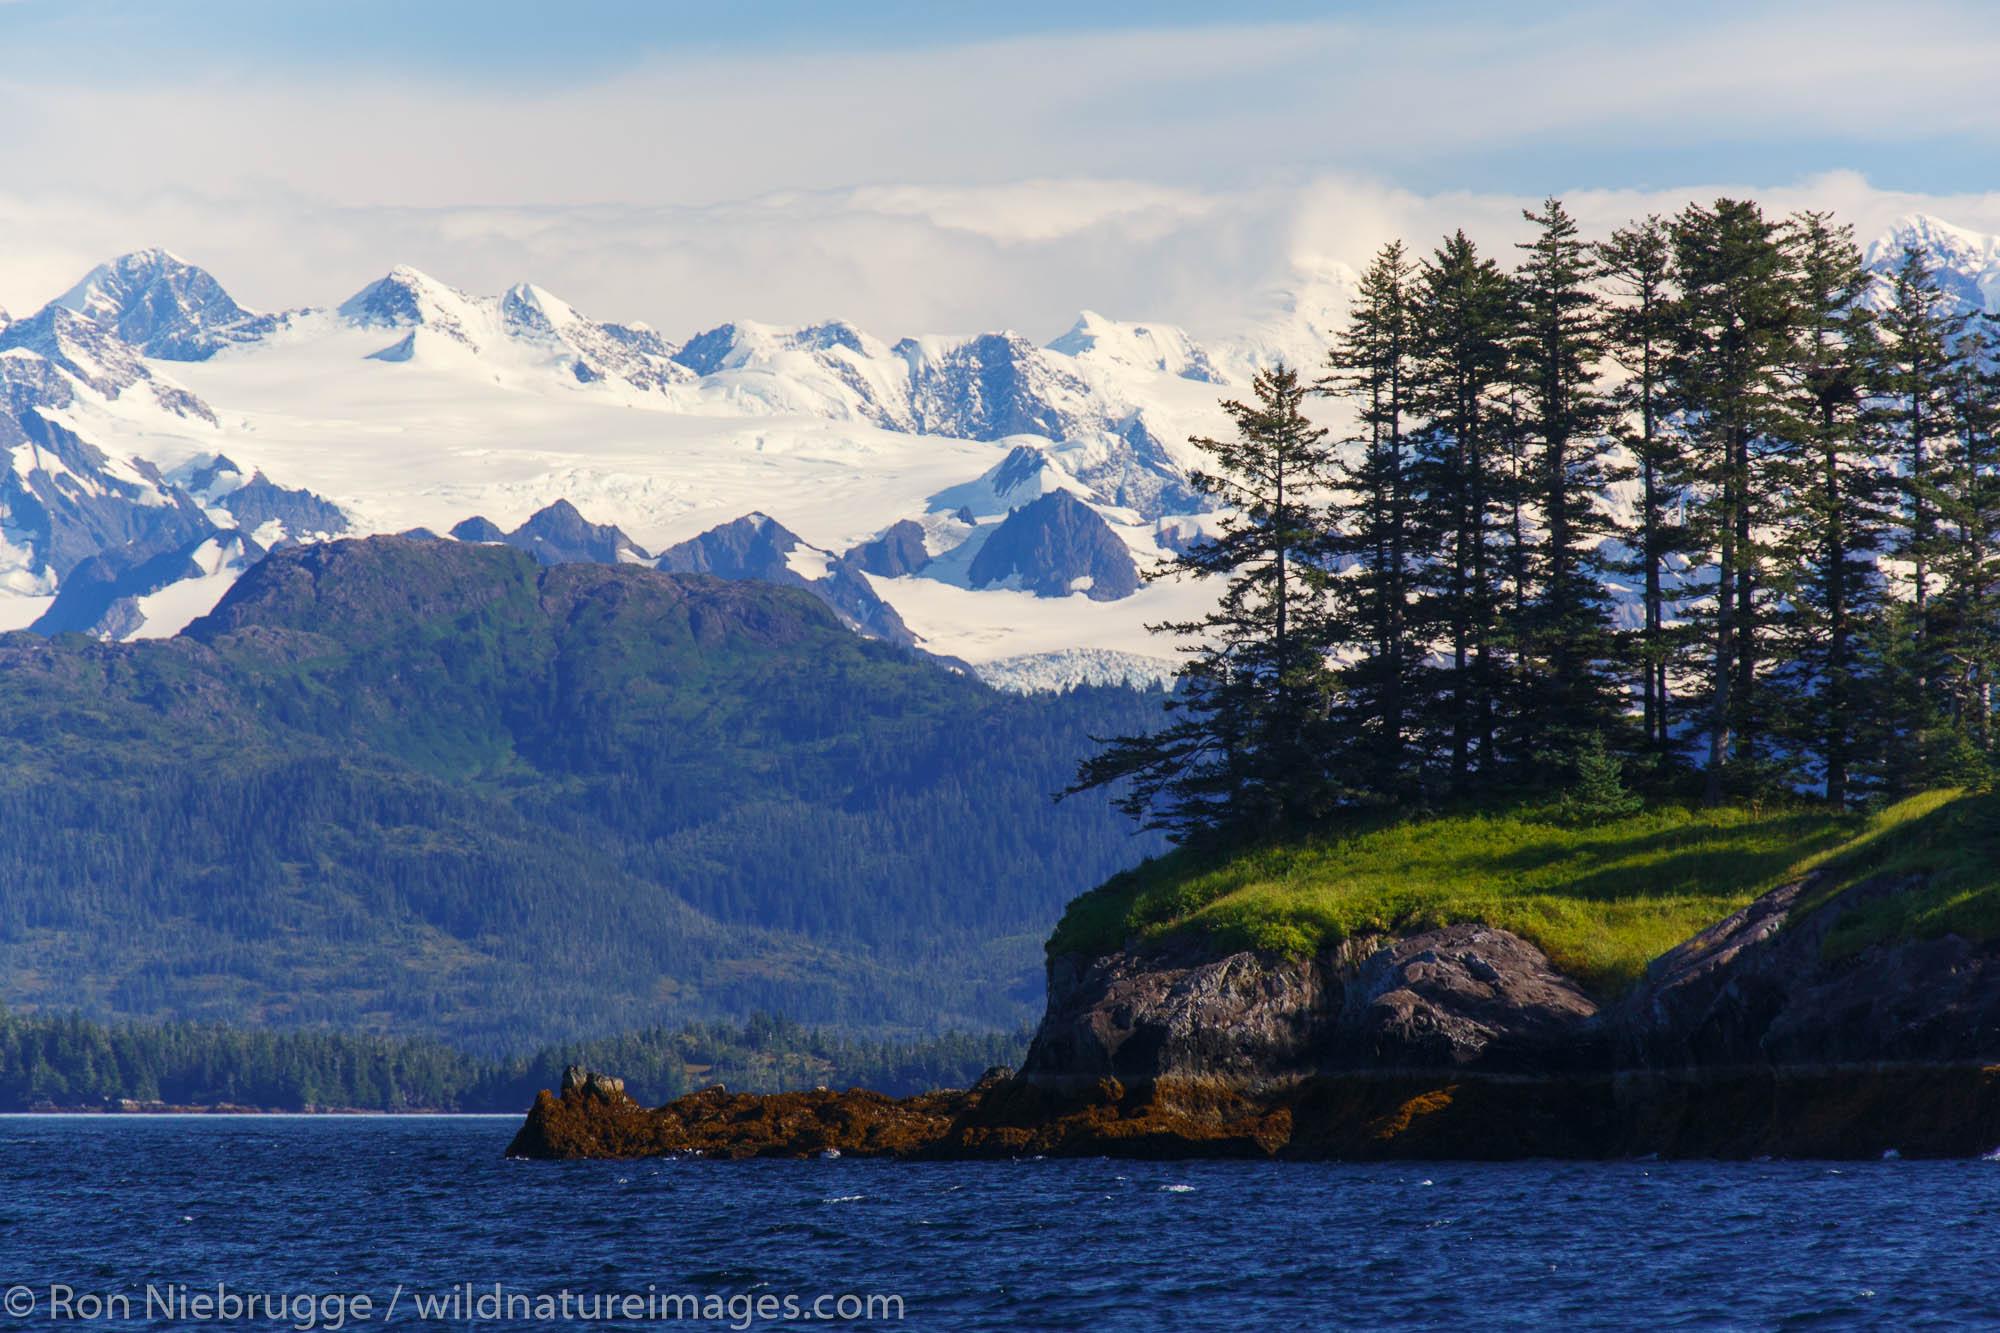 Prince William Sound, Chugach National Forest, Alaska.